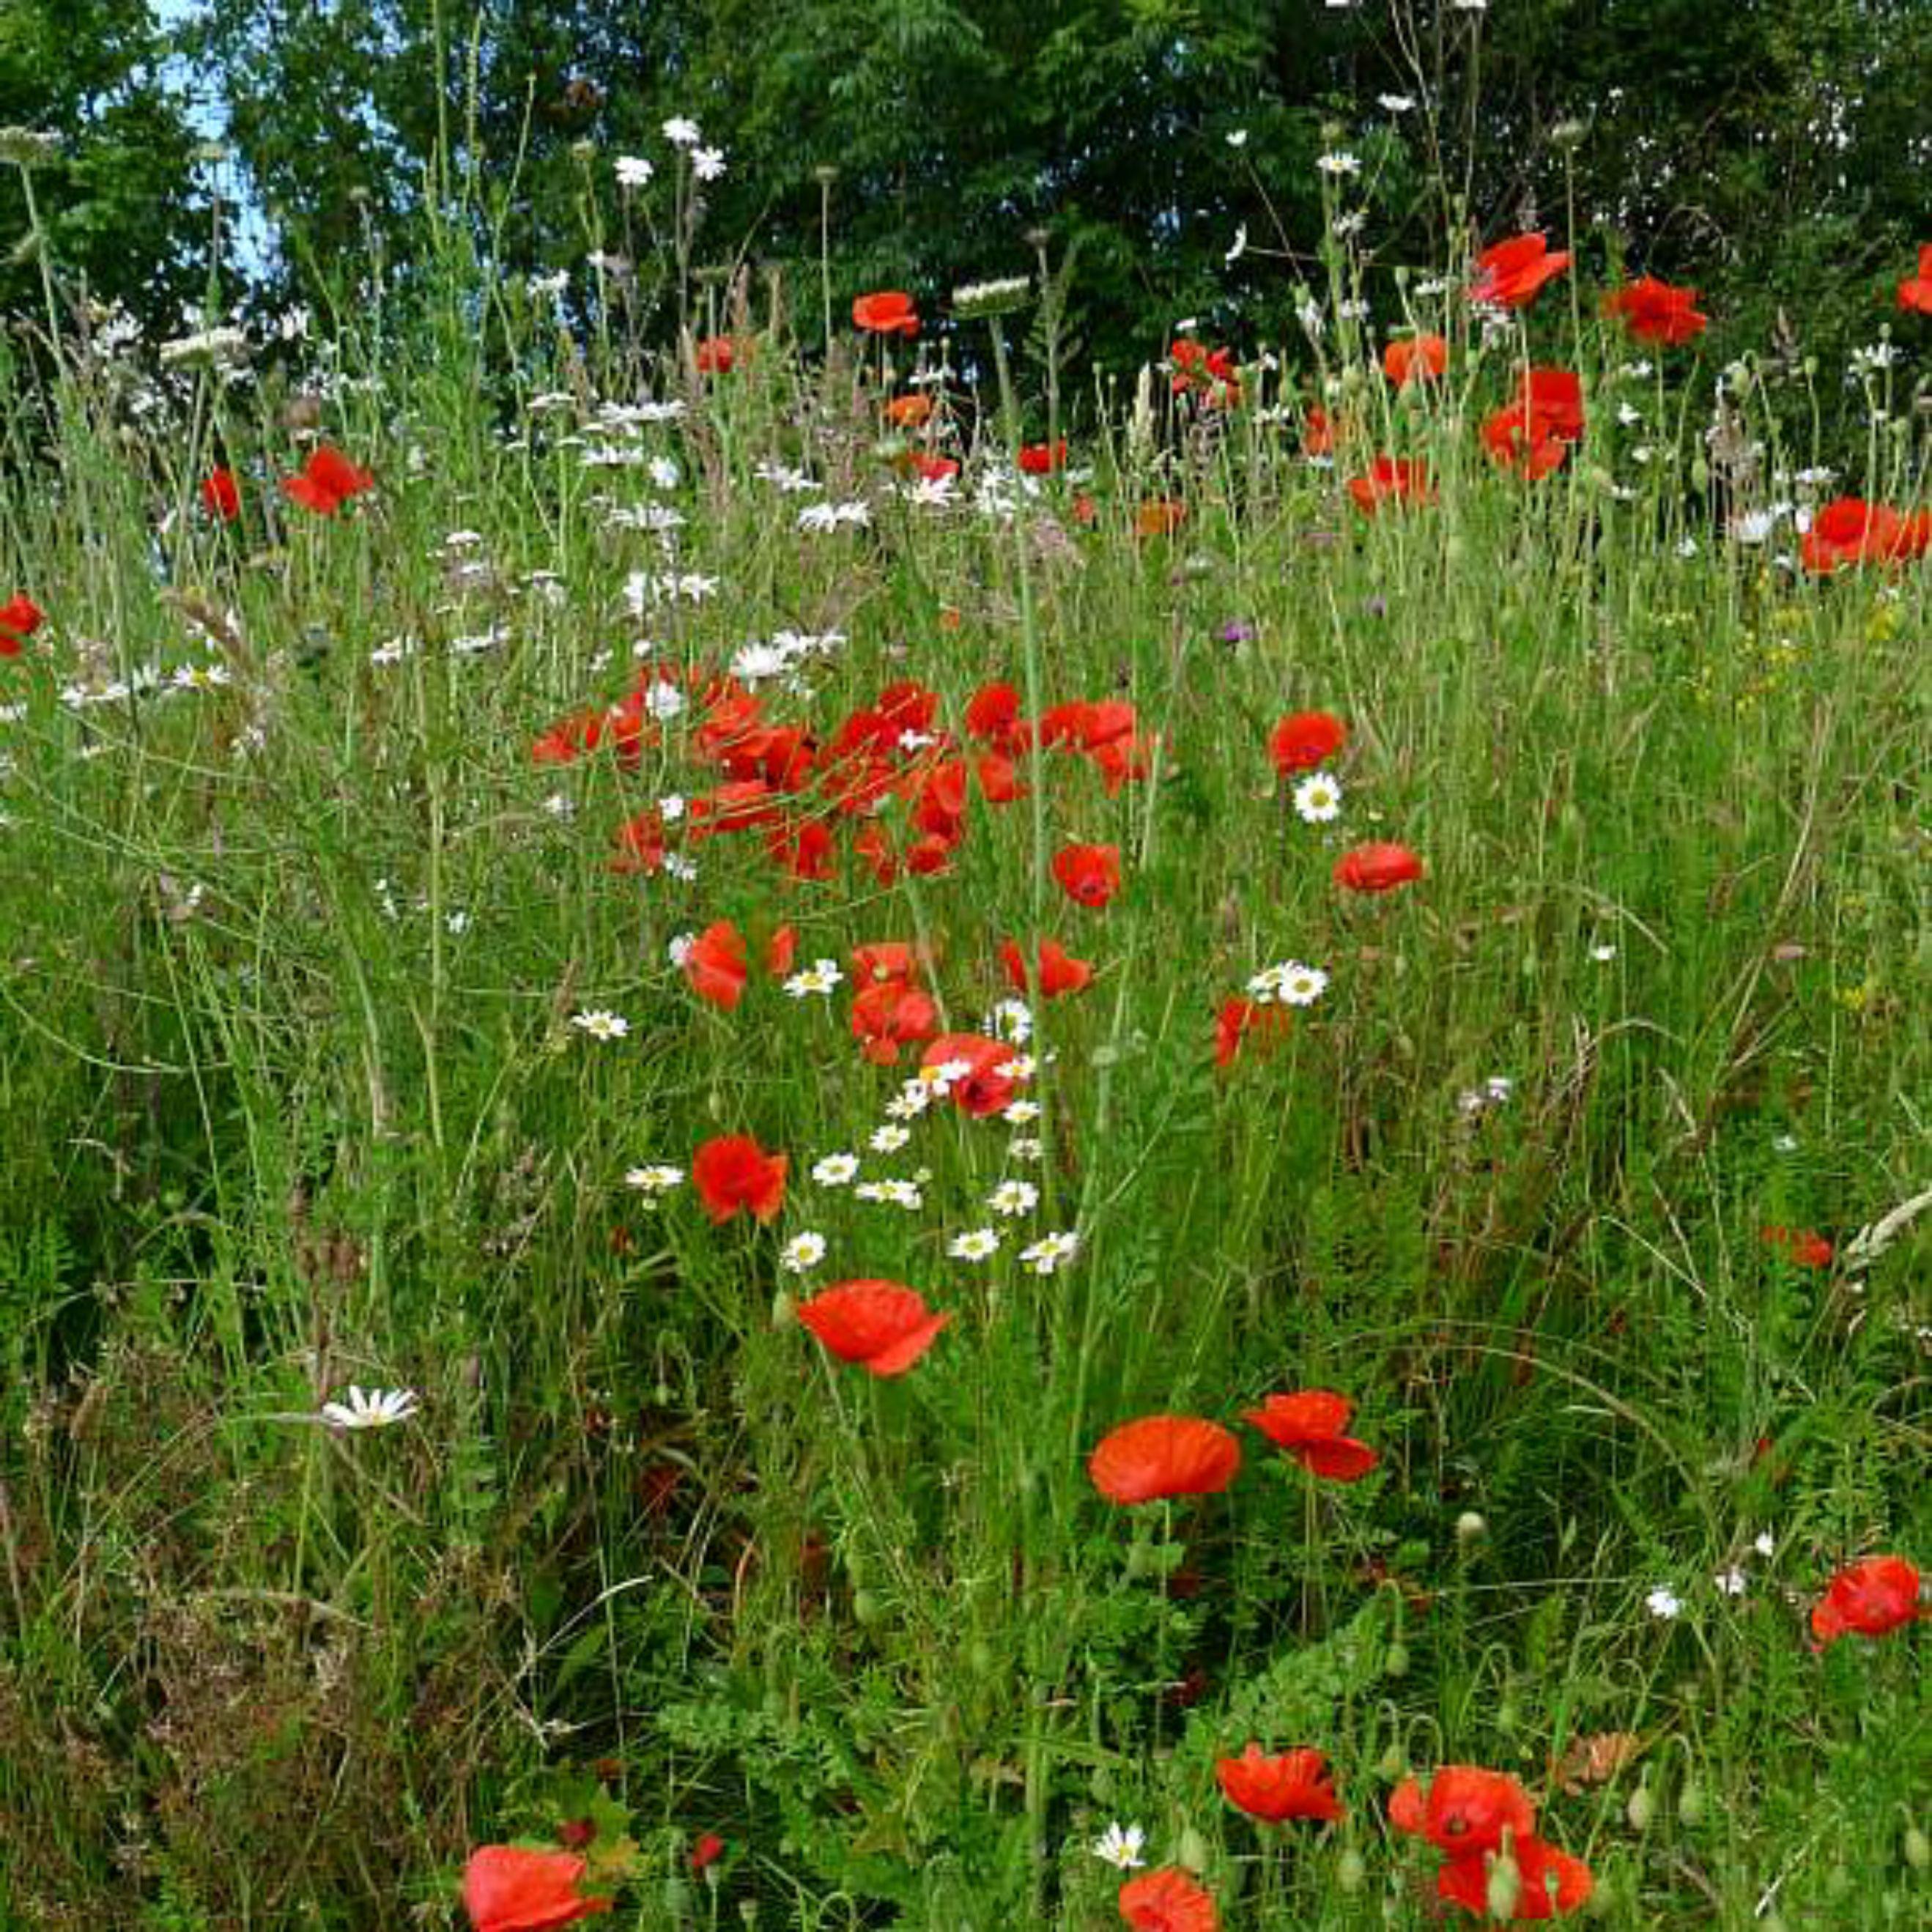 Common poppy petals wild collection